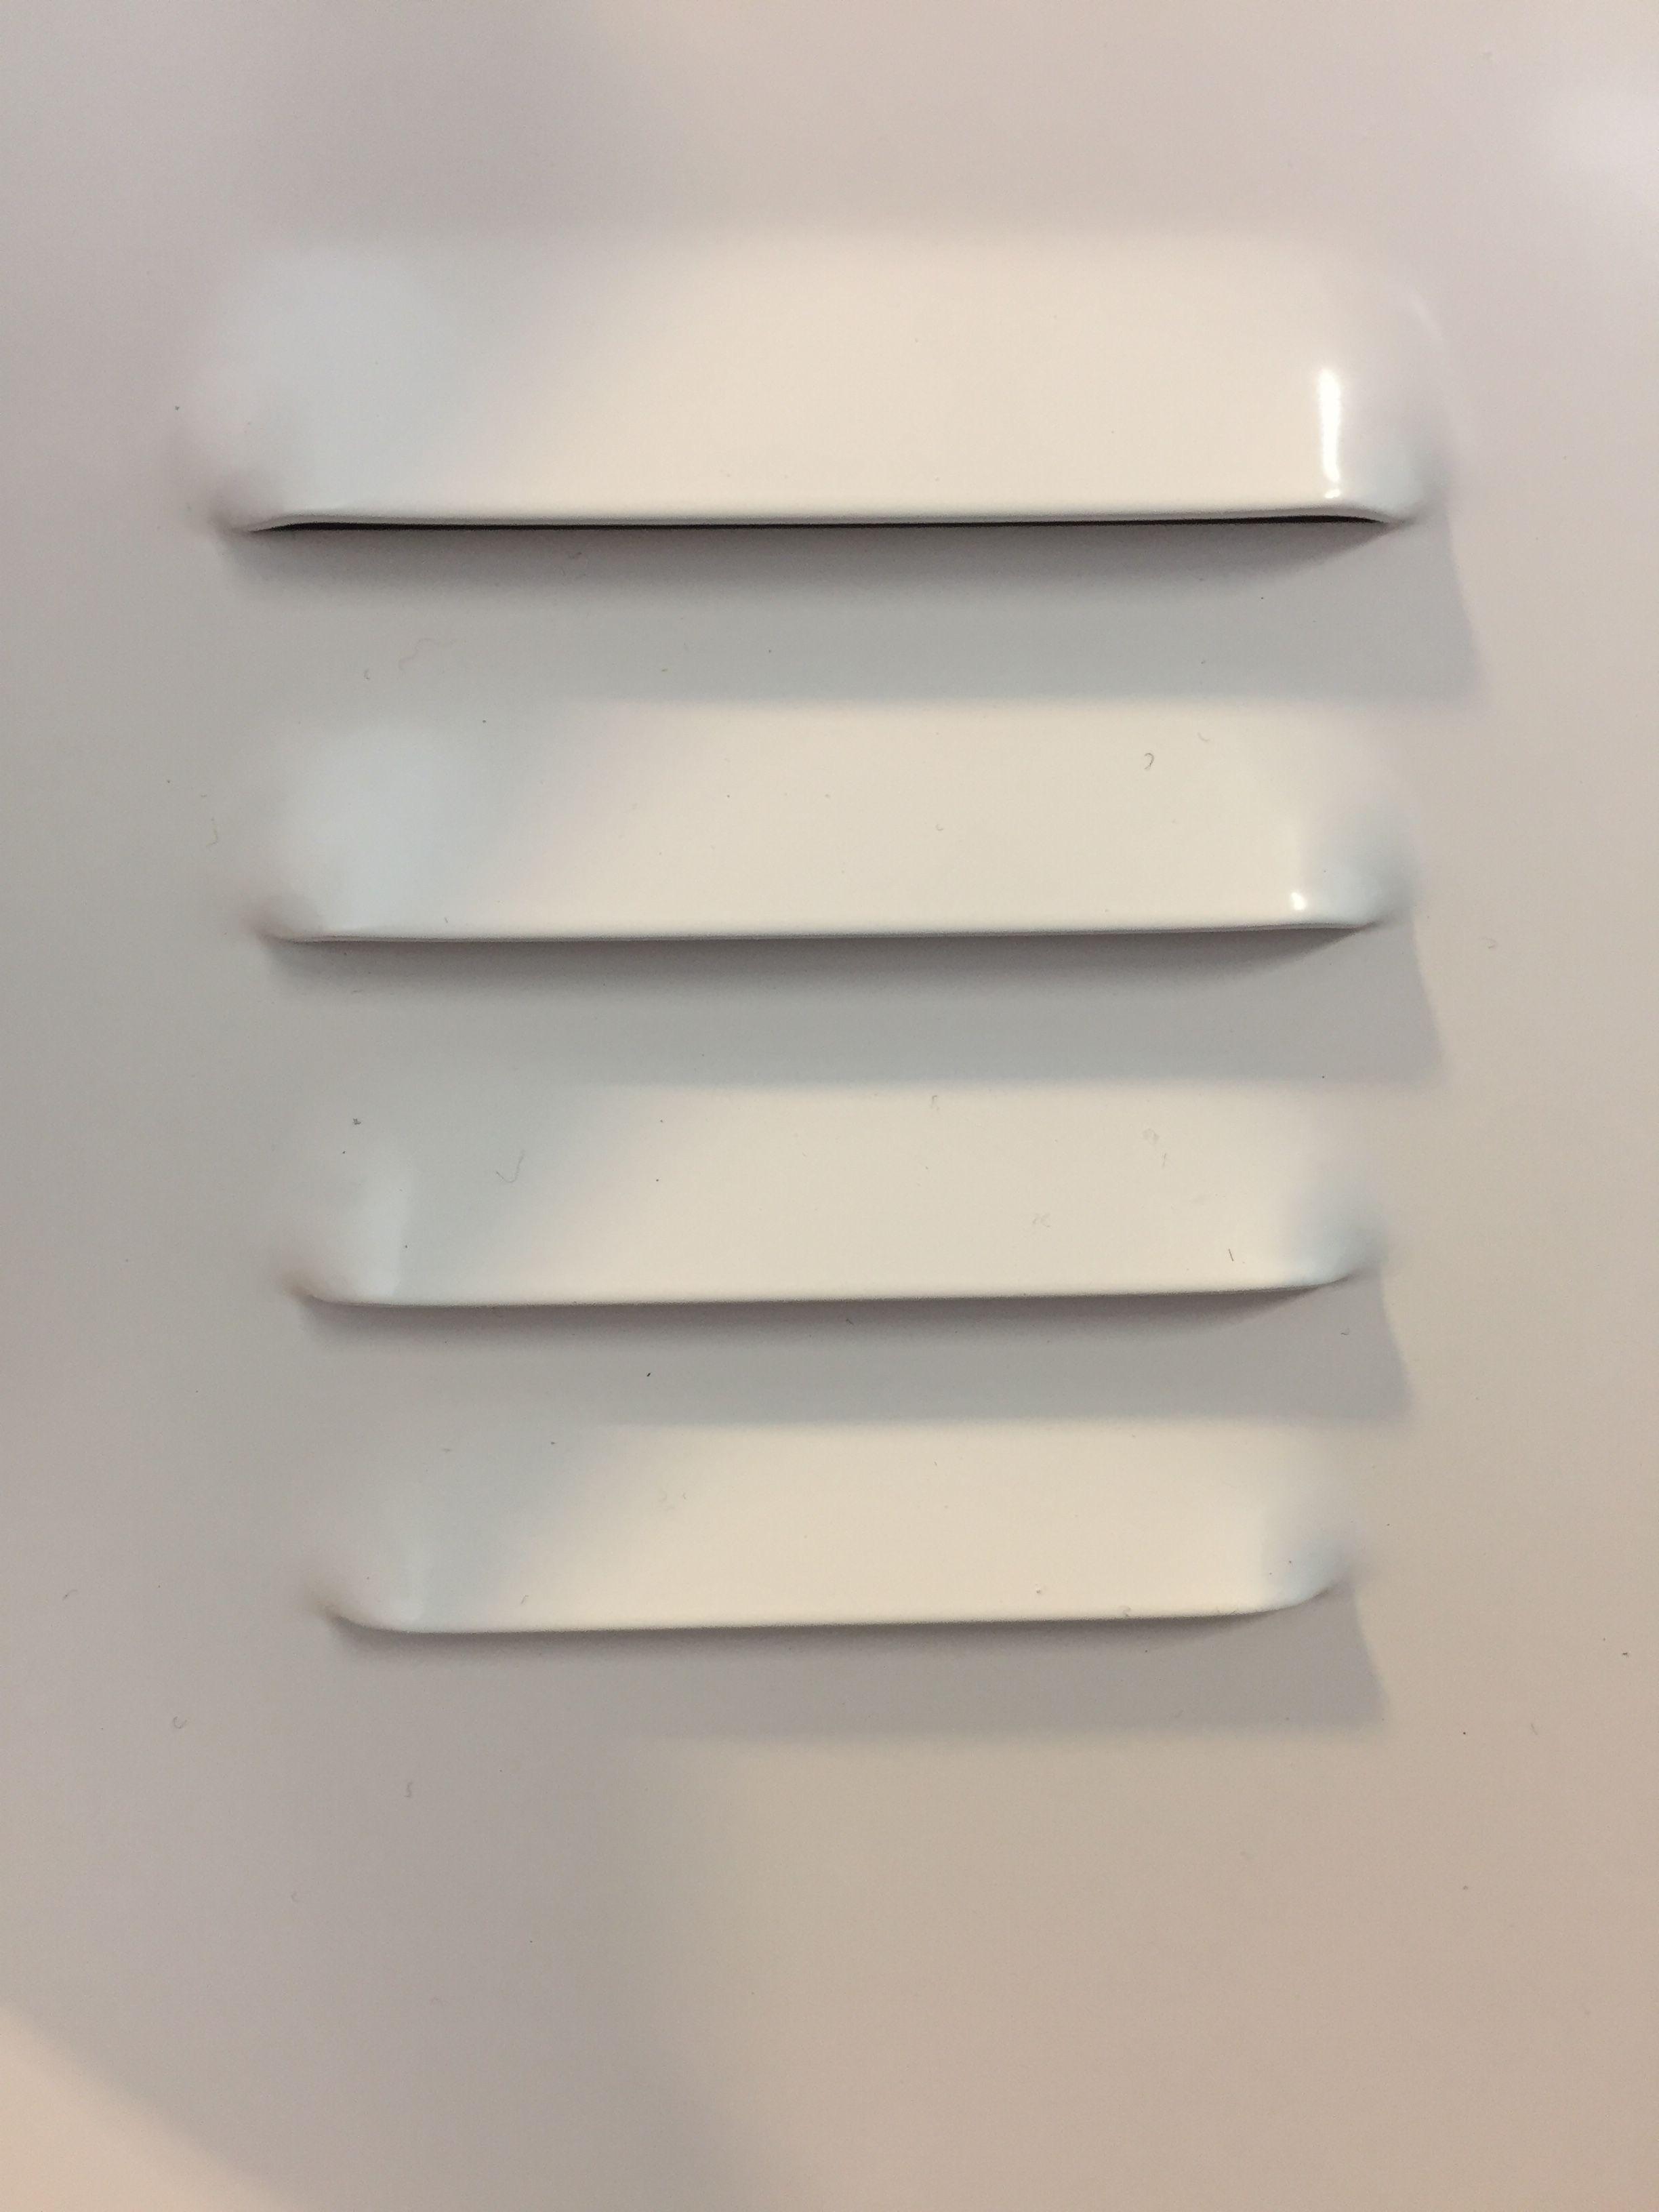 Locker - horizontale lijnen